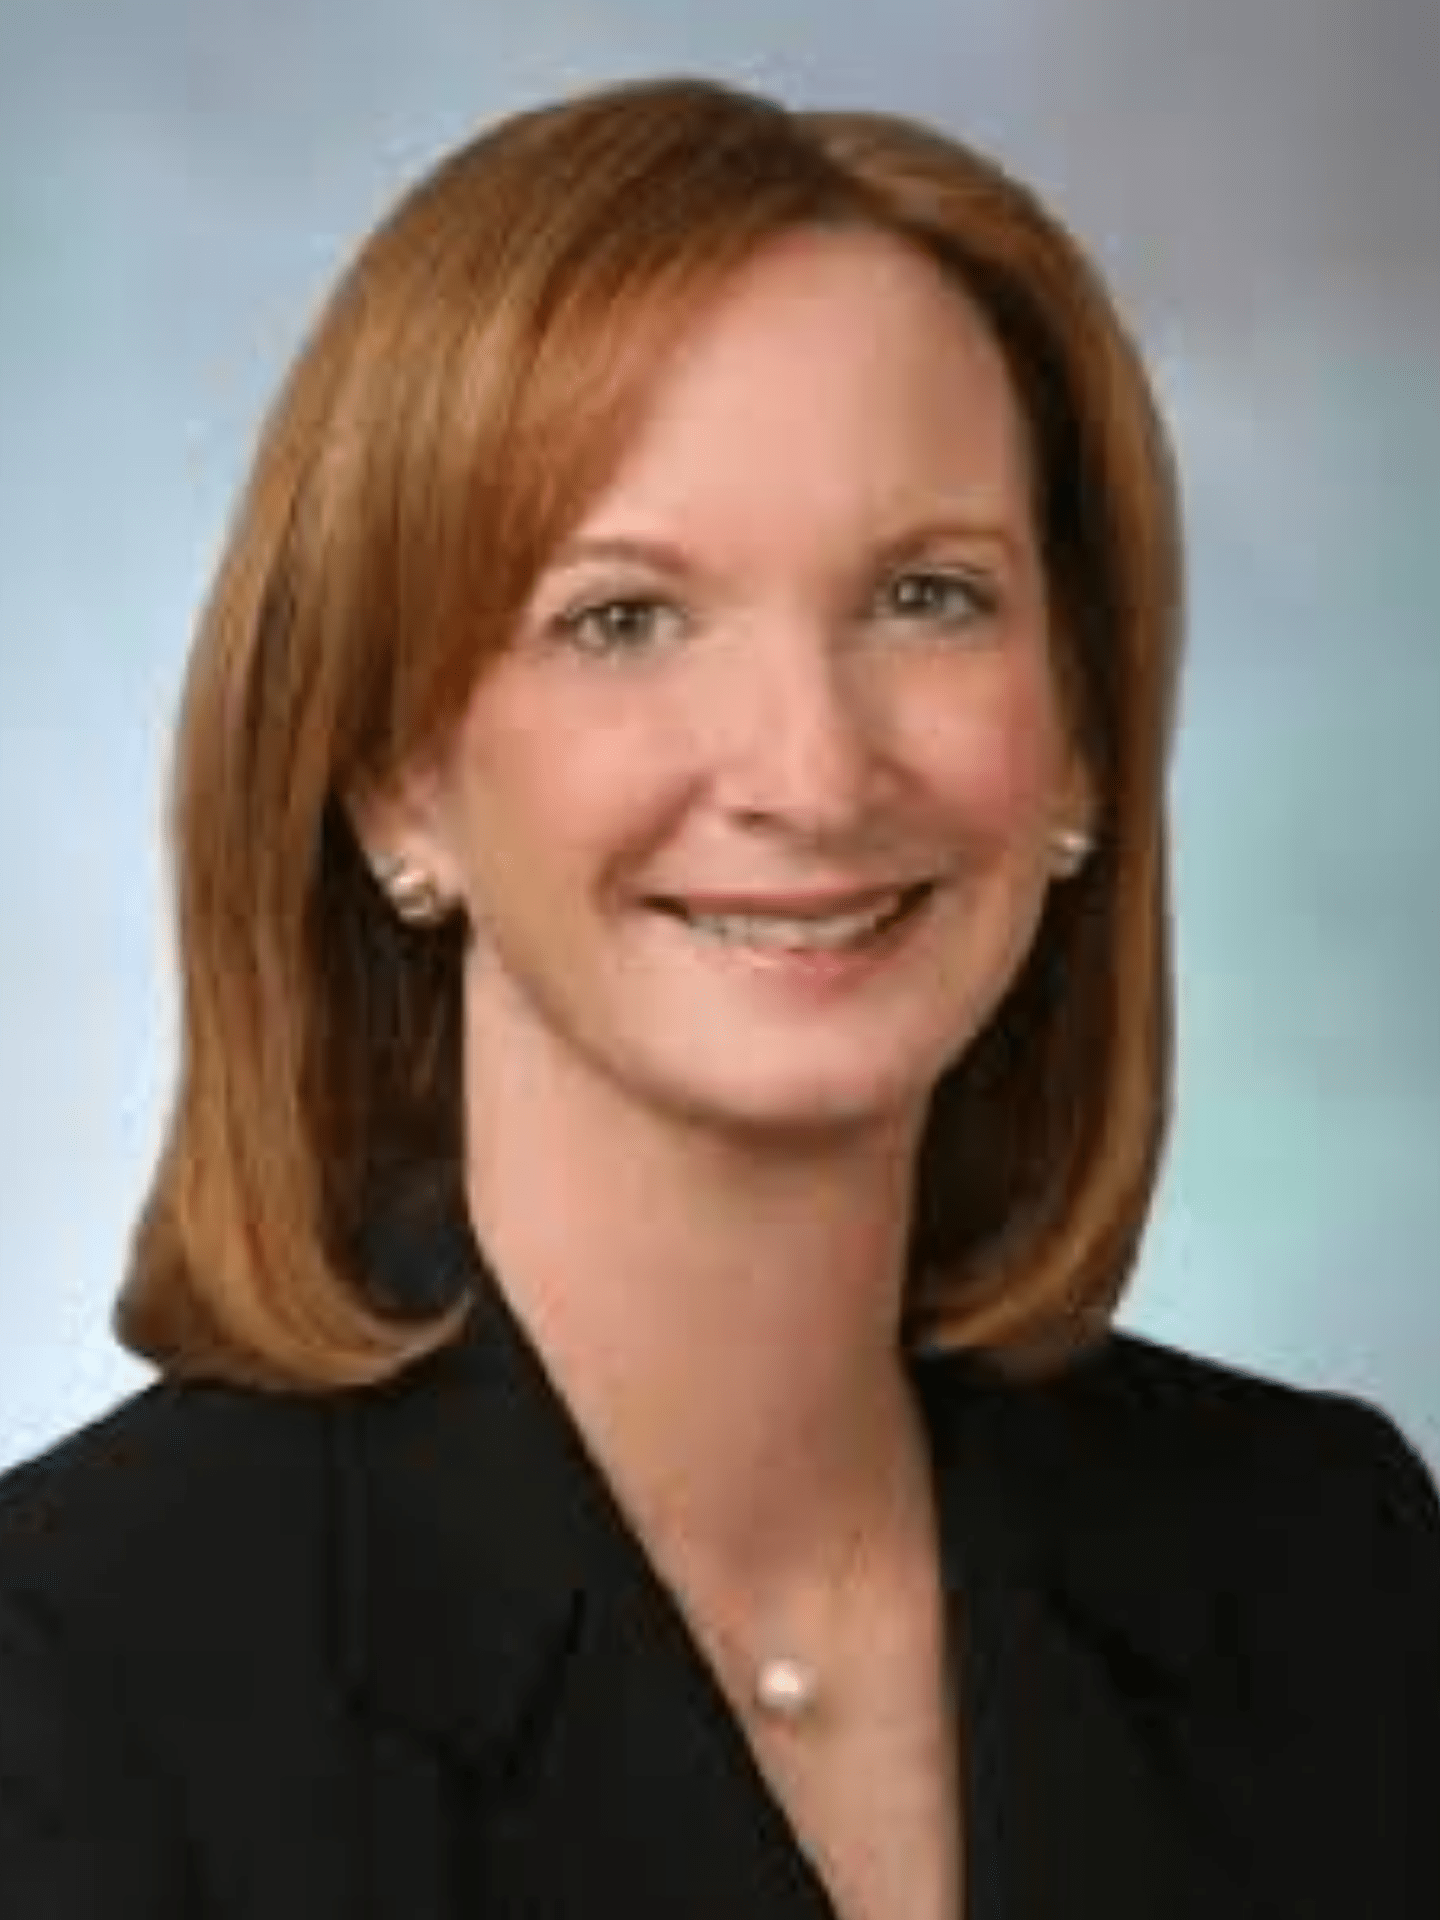 Ms. Deborah Ratner Salzberg